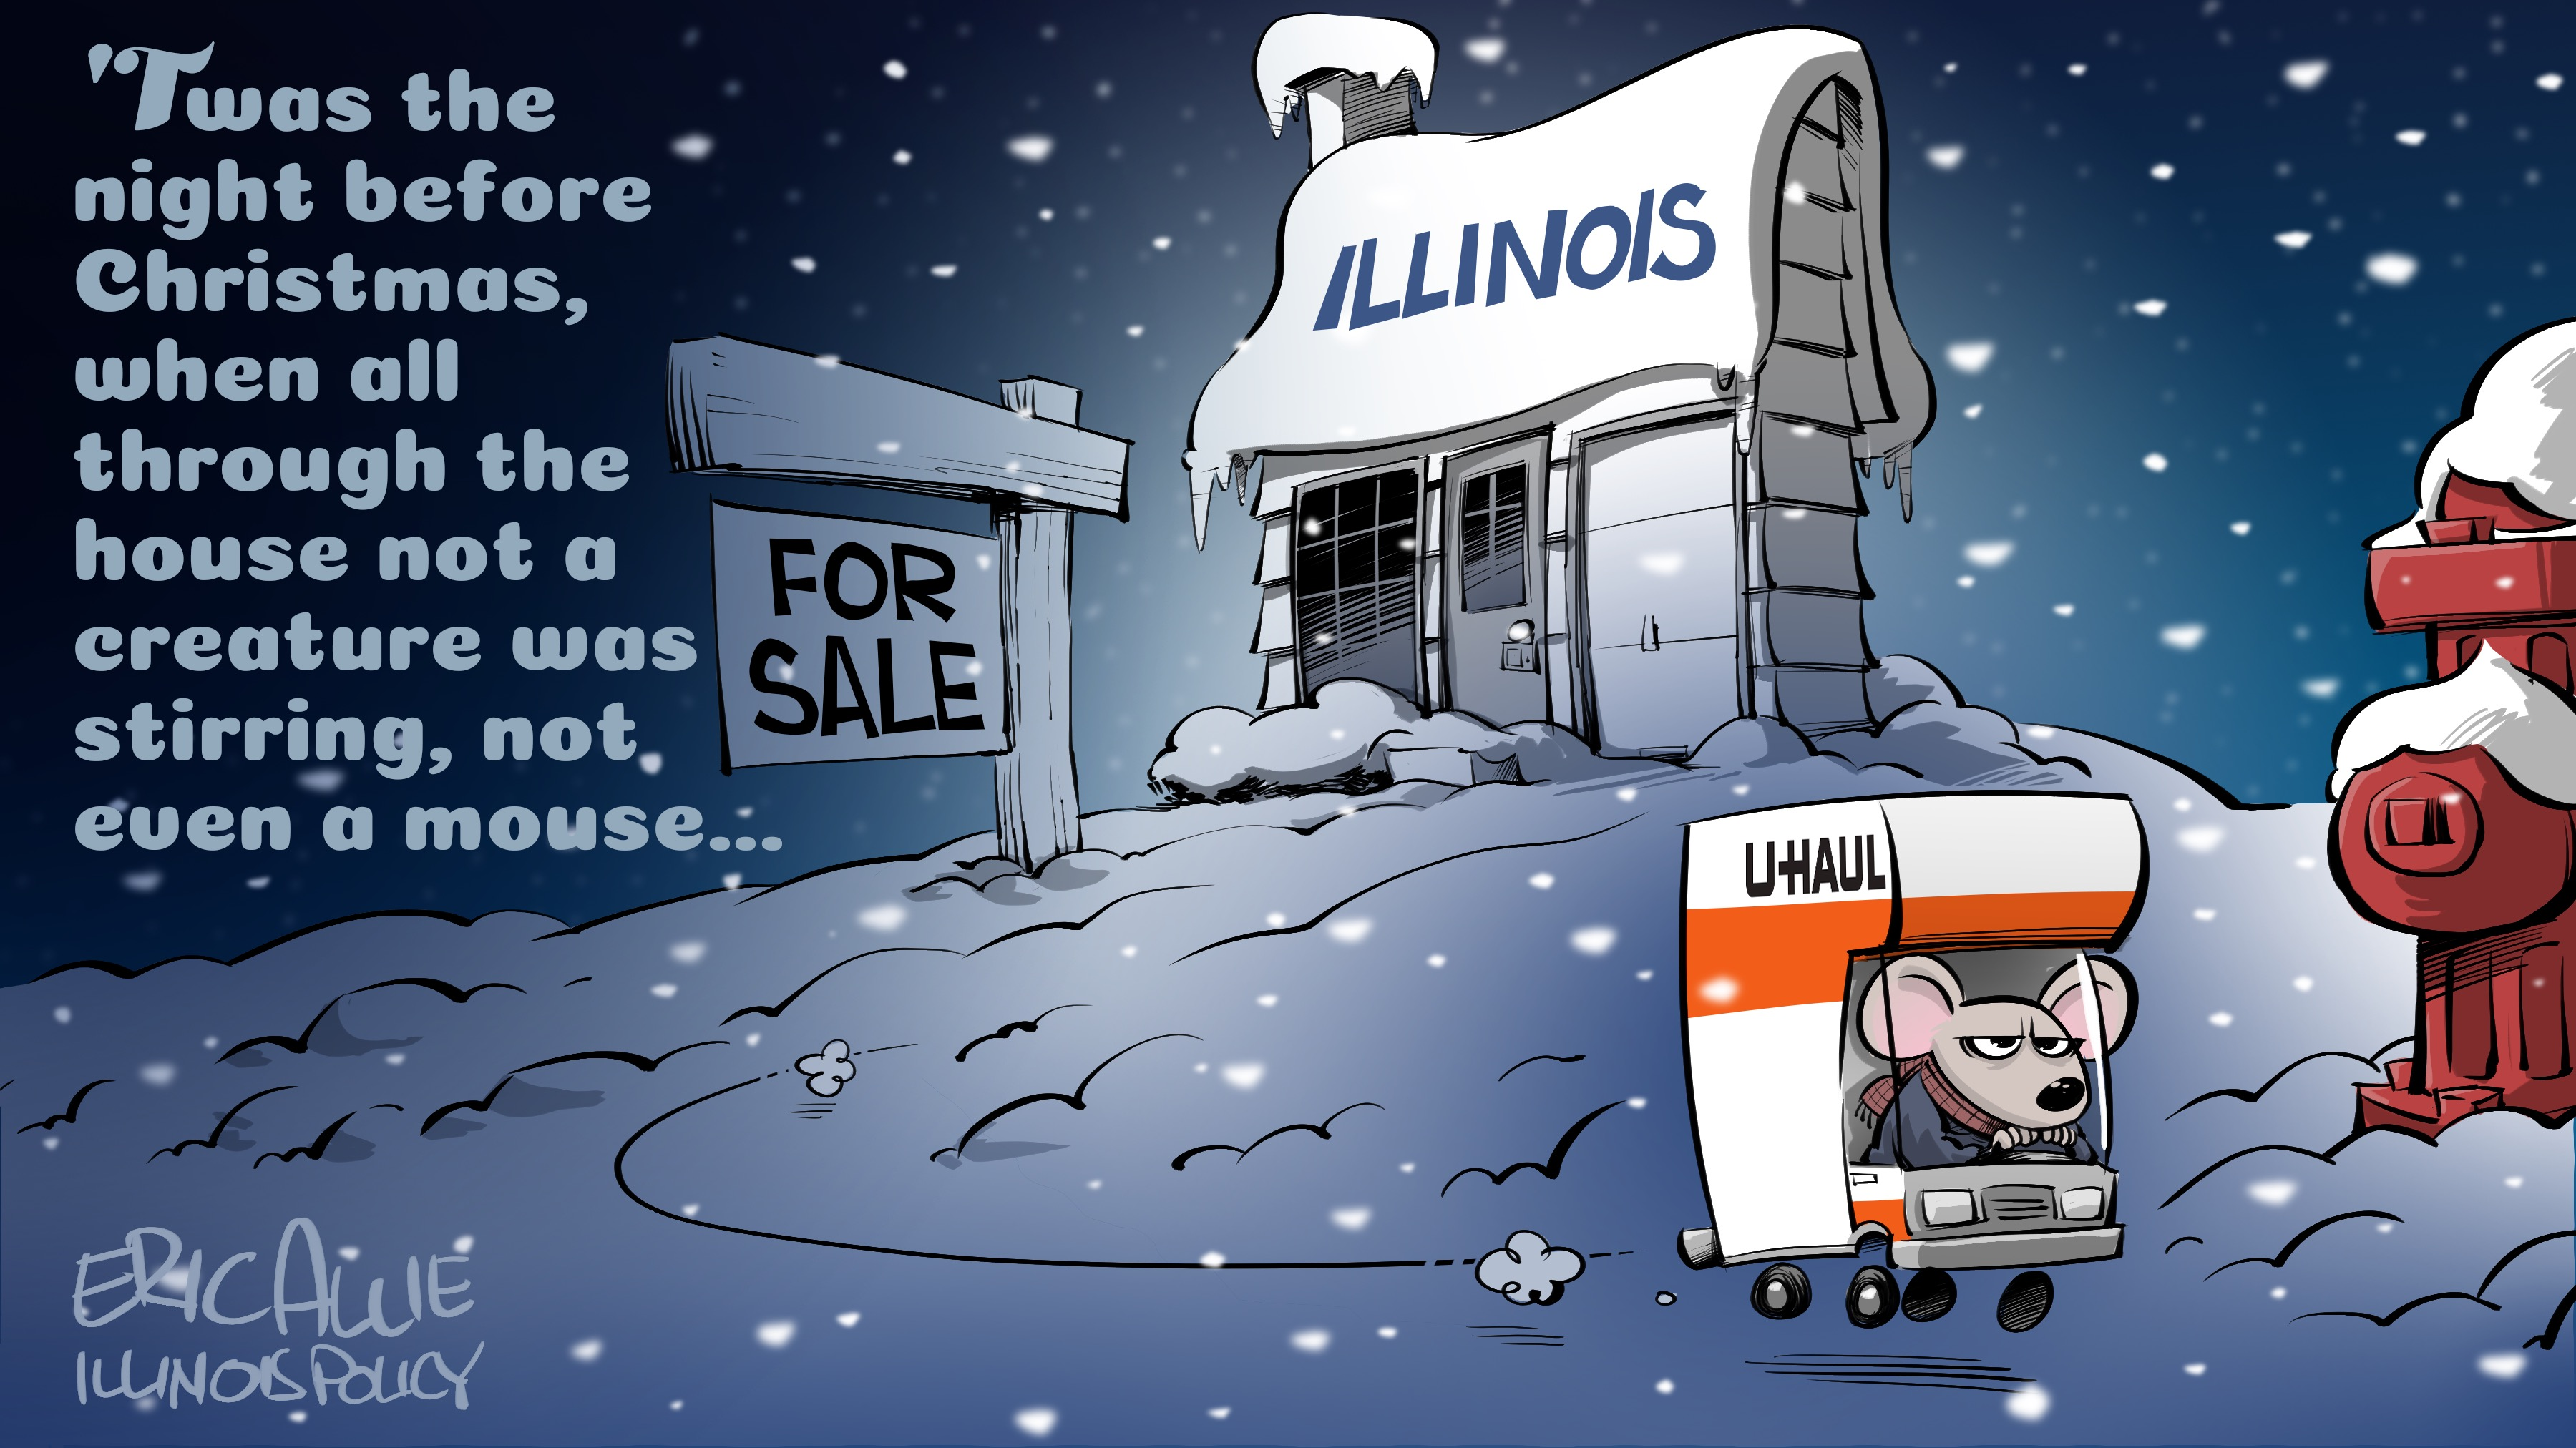 Cartoon: Twas the night before Christmas in Illinois